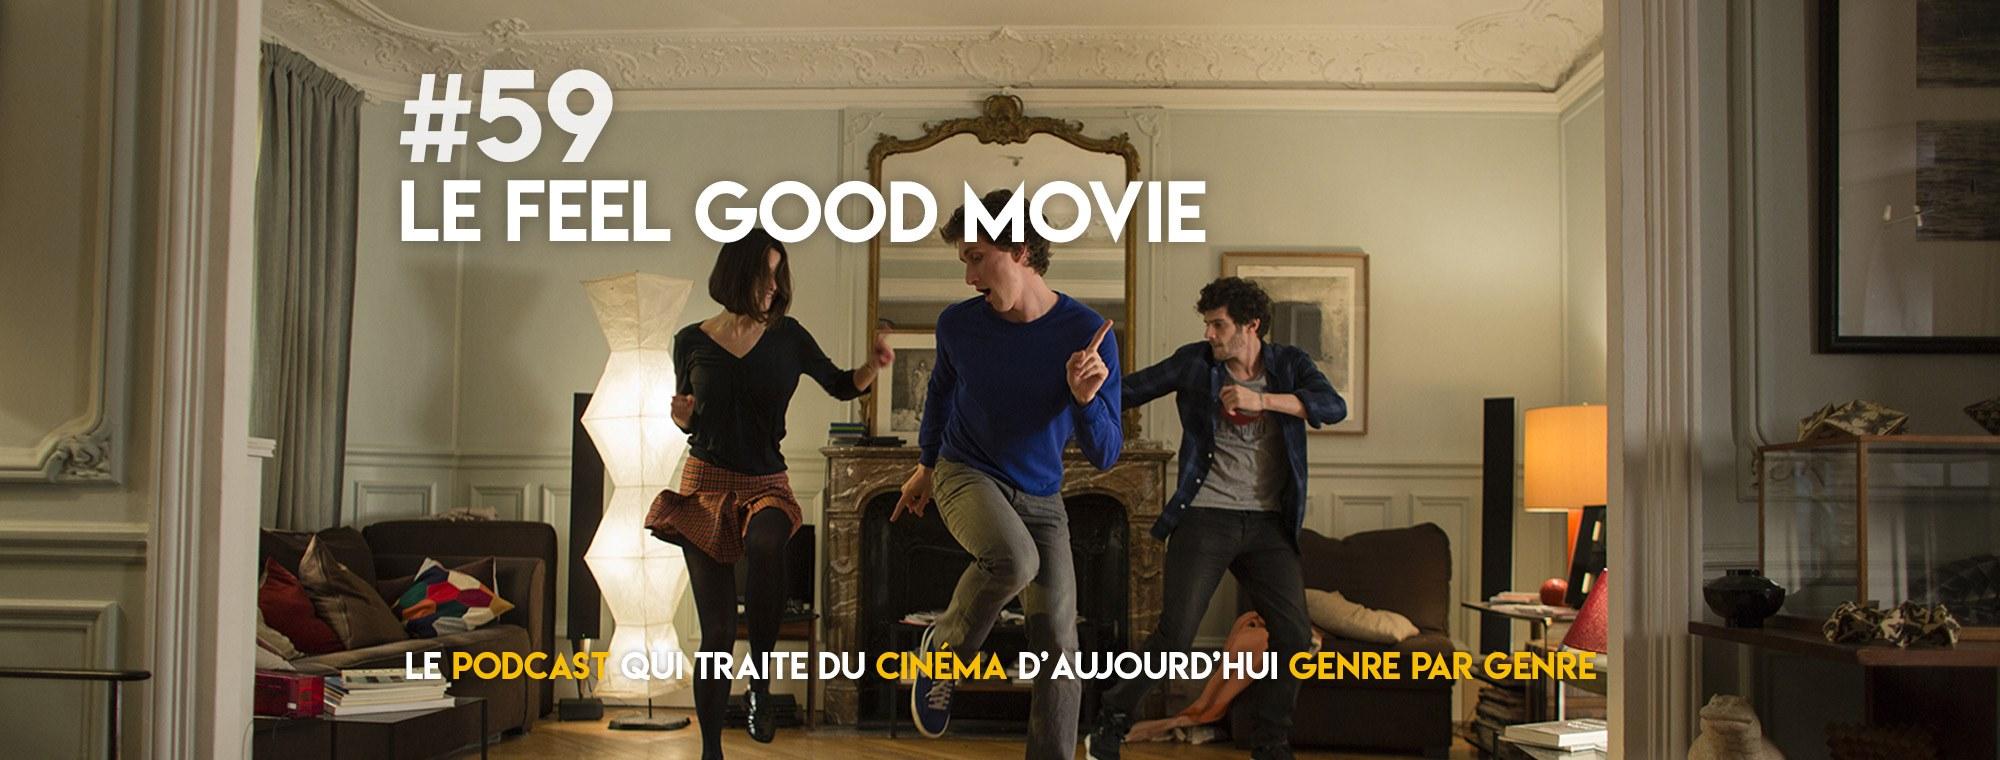 Parlons Péloches - #59 Le feel good movie (ft. Sophie Riche)